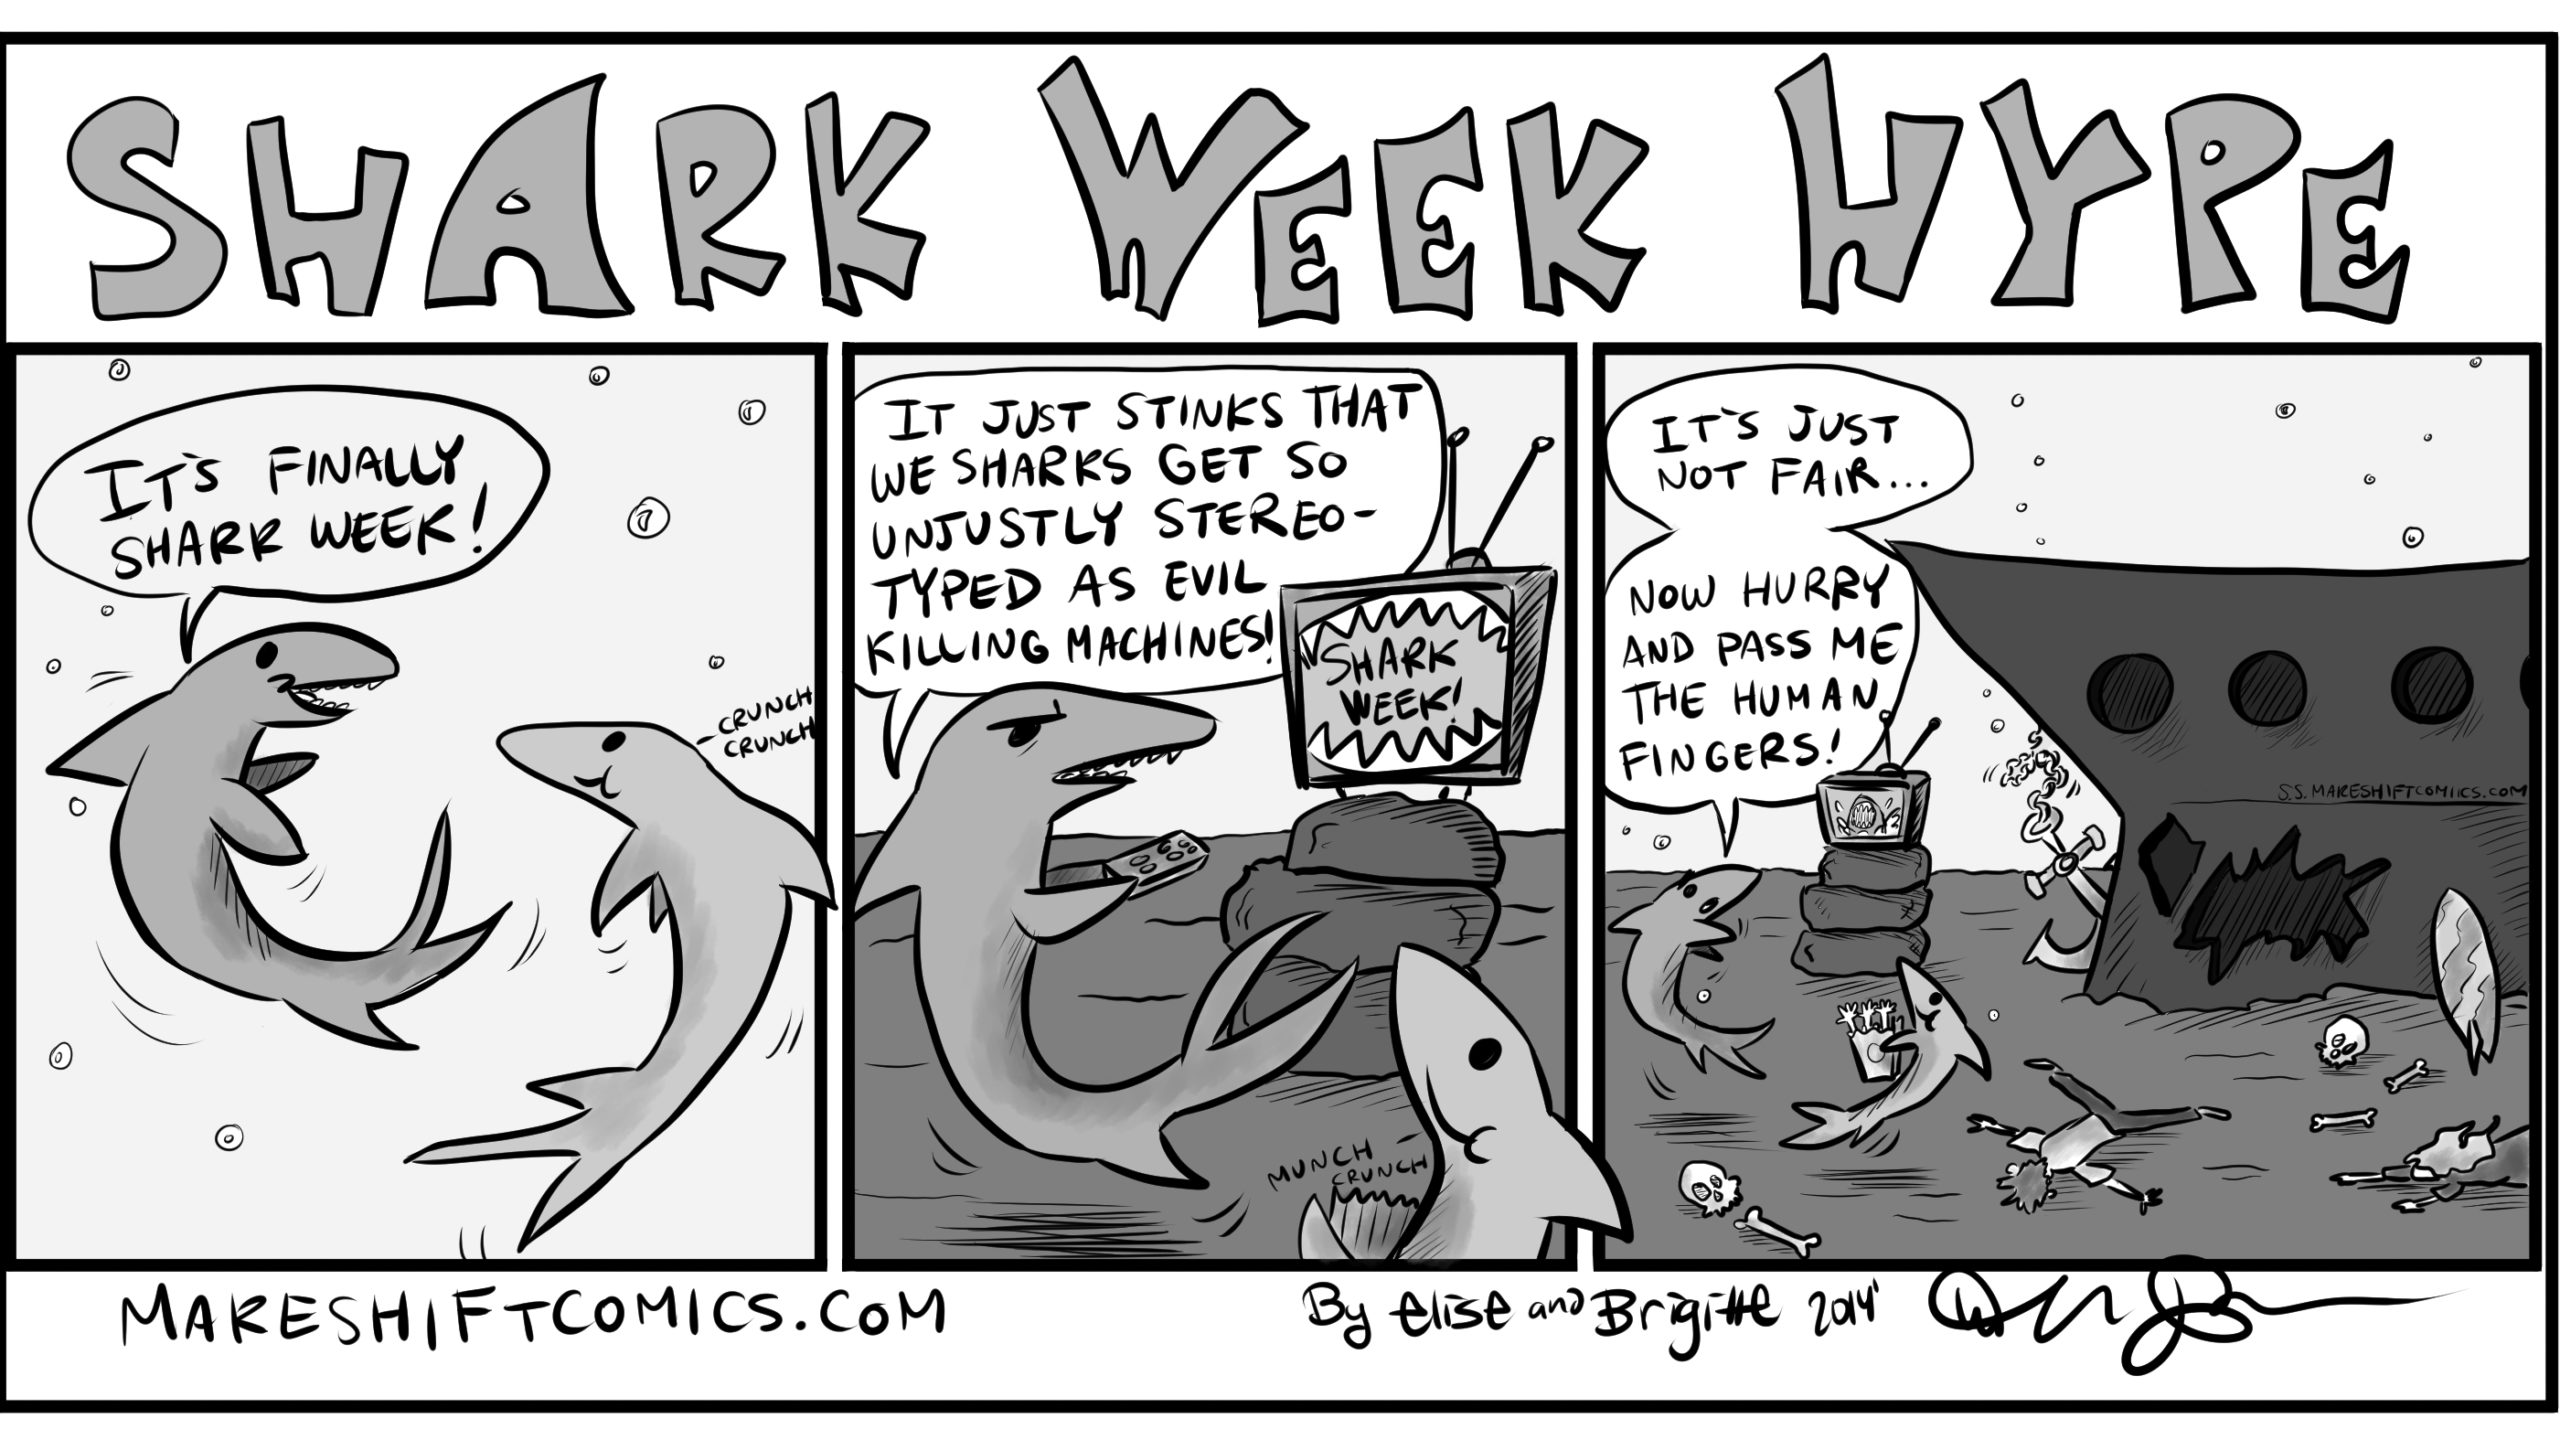 Shark Week Hype